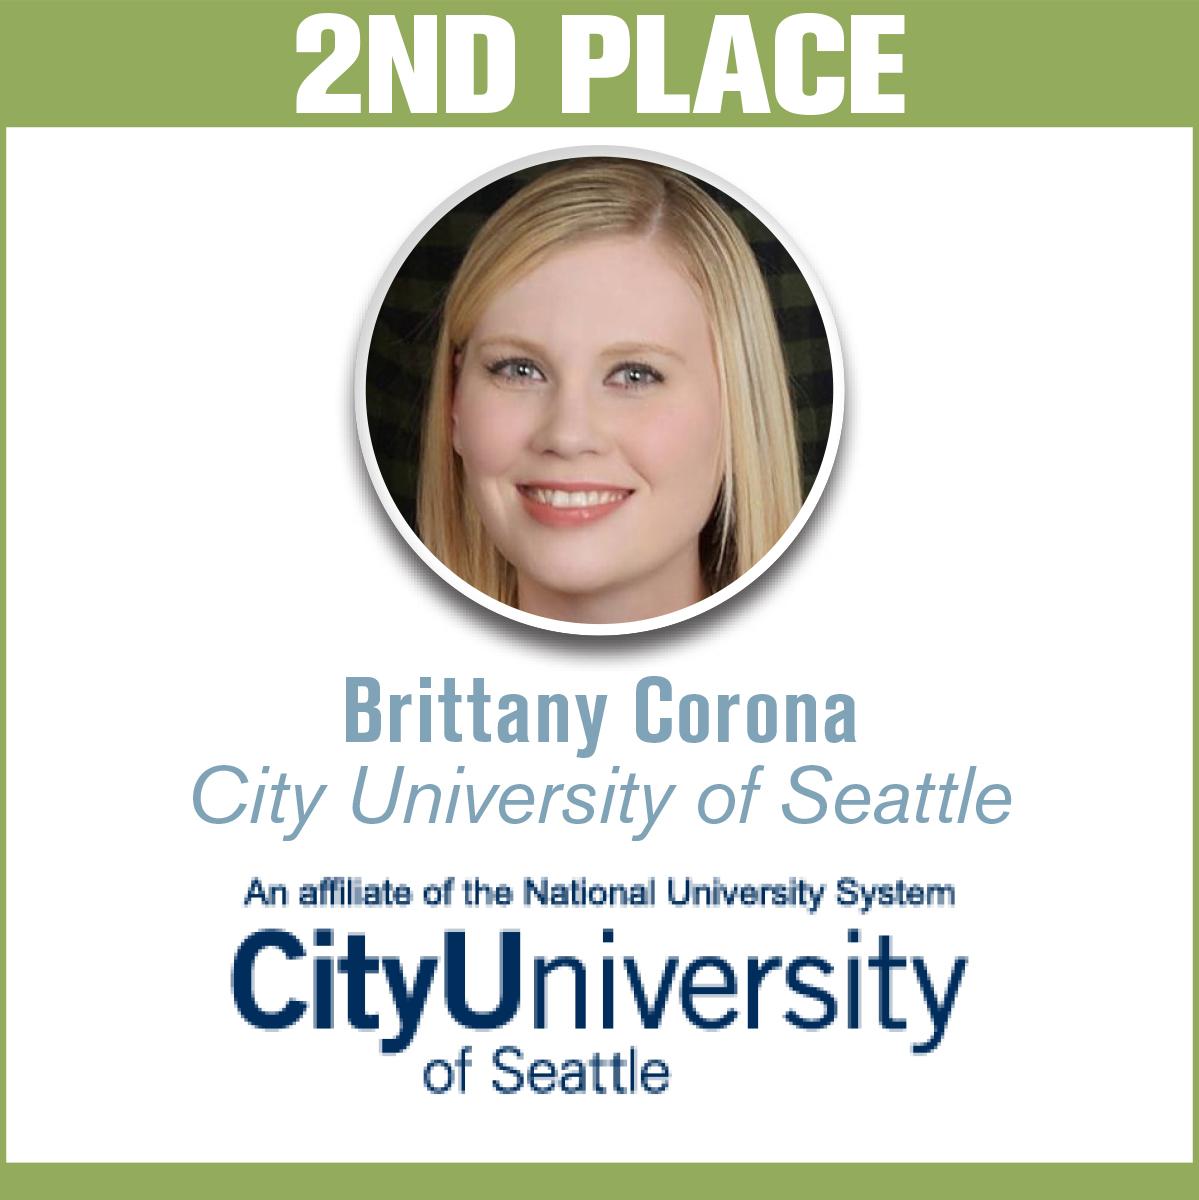 Brittany Corona City University of Seattle